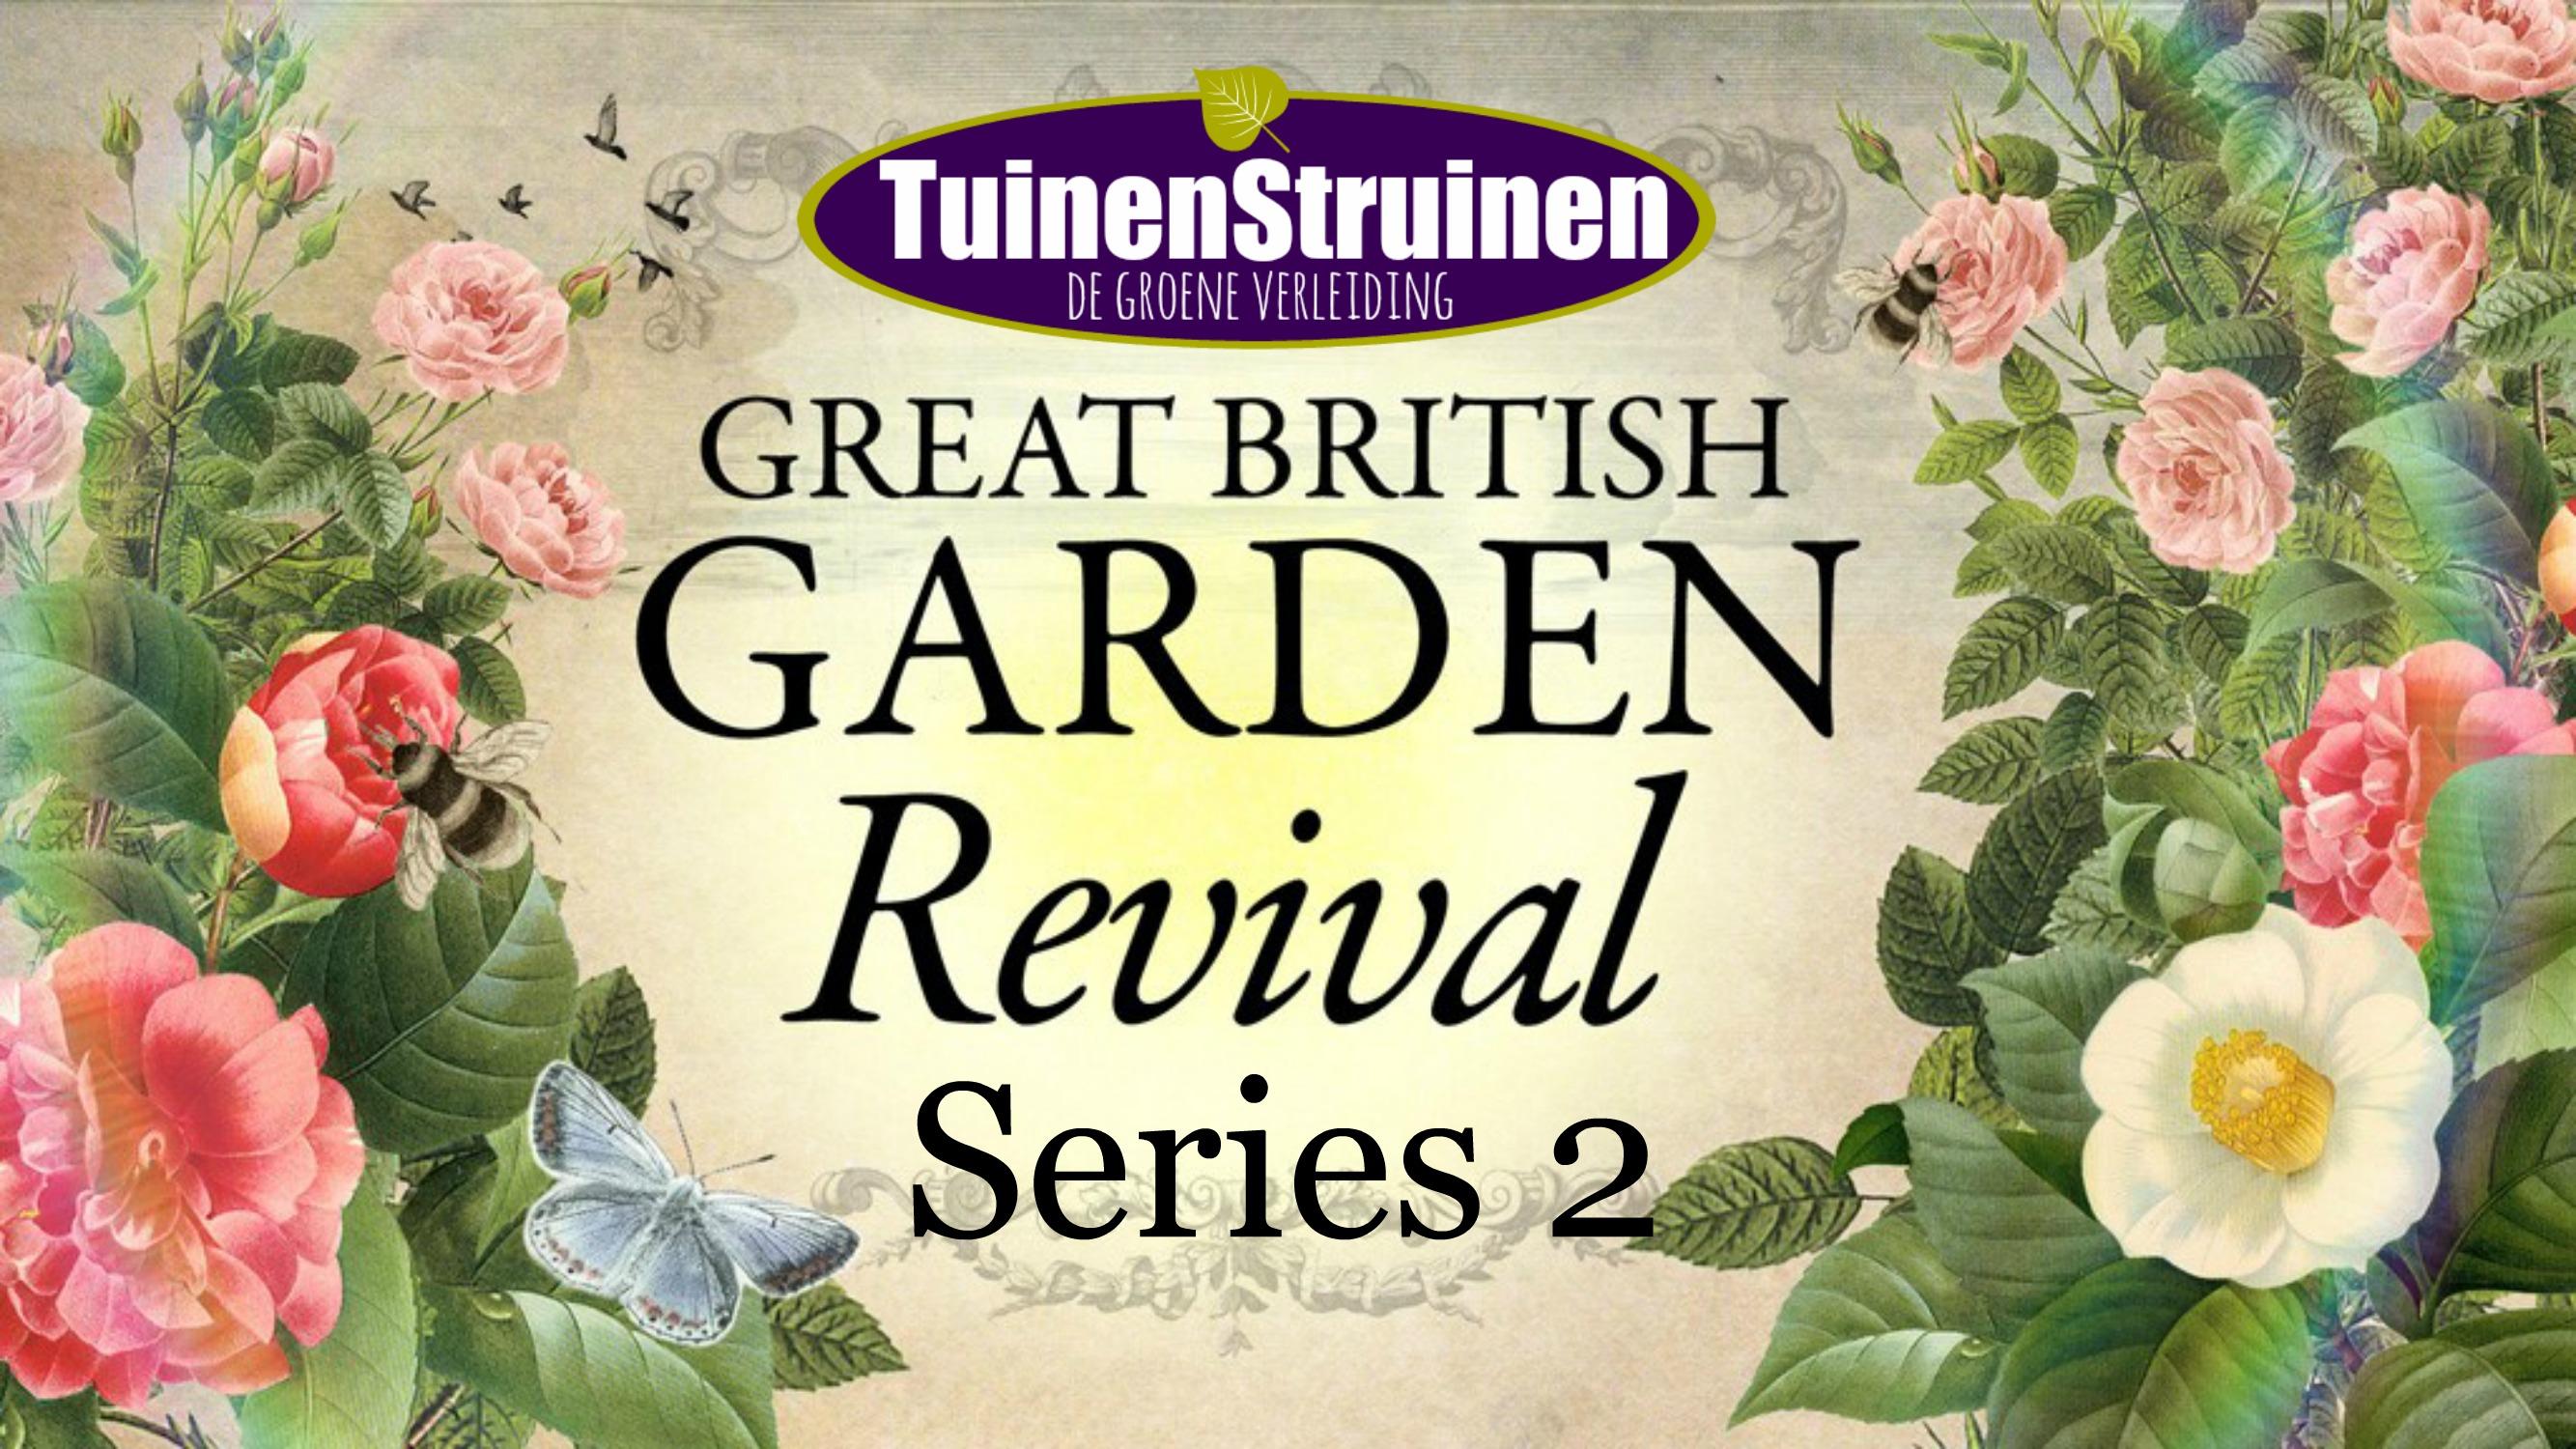 Great British Garden Revival  Series 2 (all episodes)